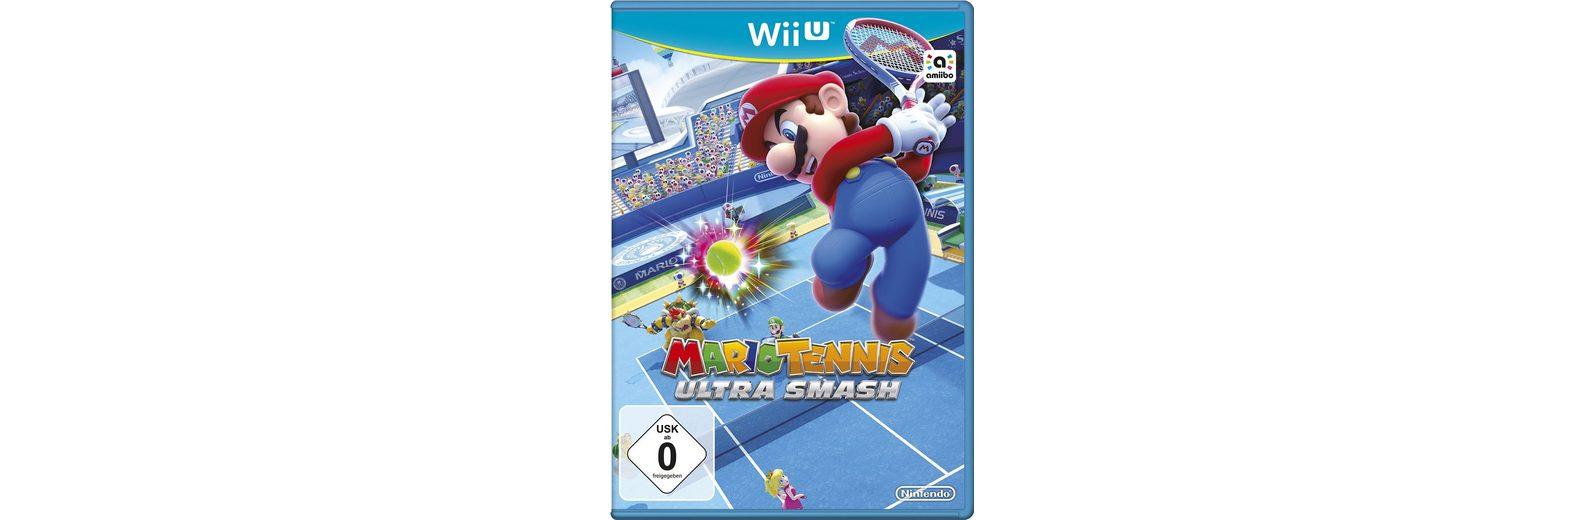 Mario Tennis: Ultra Smash Nintendo Wii U